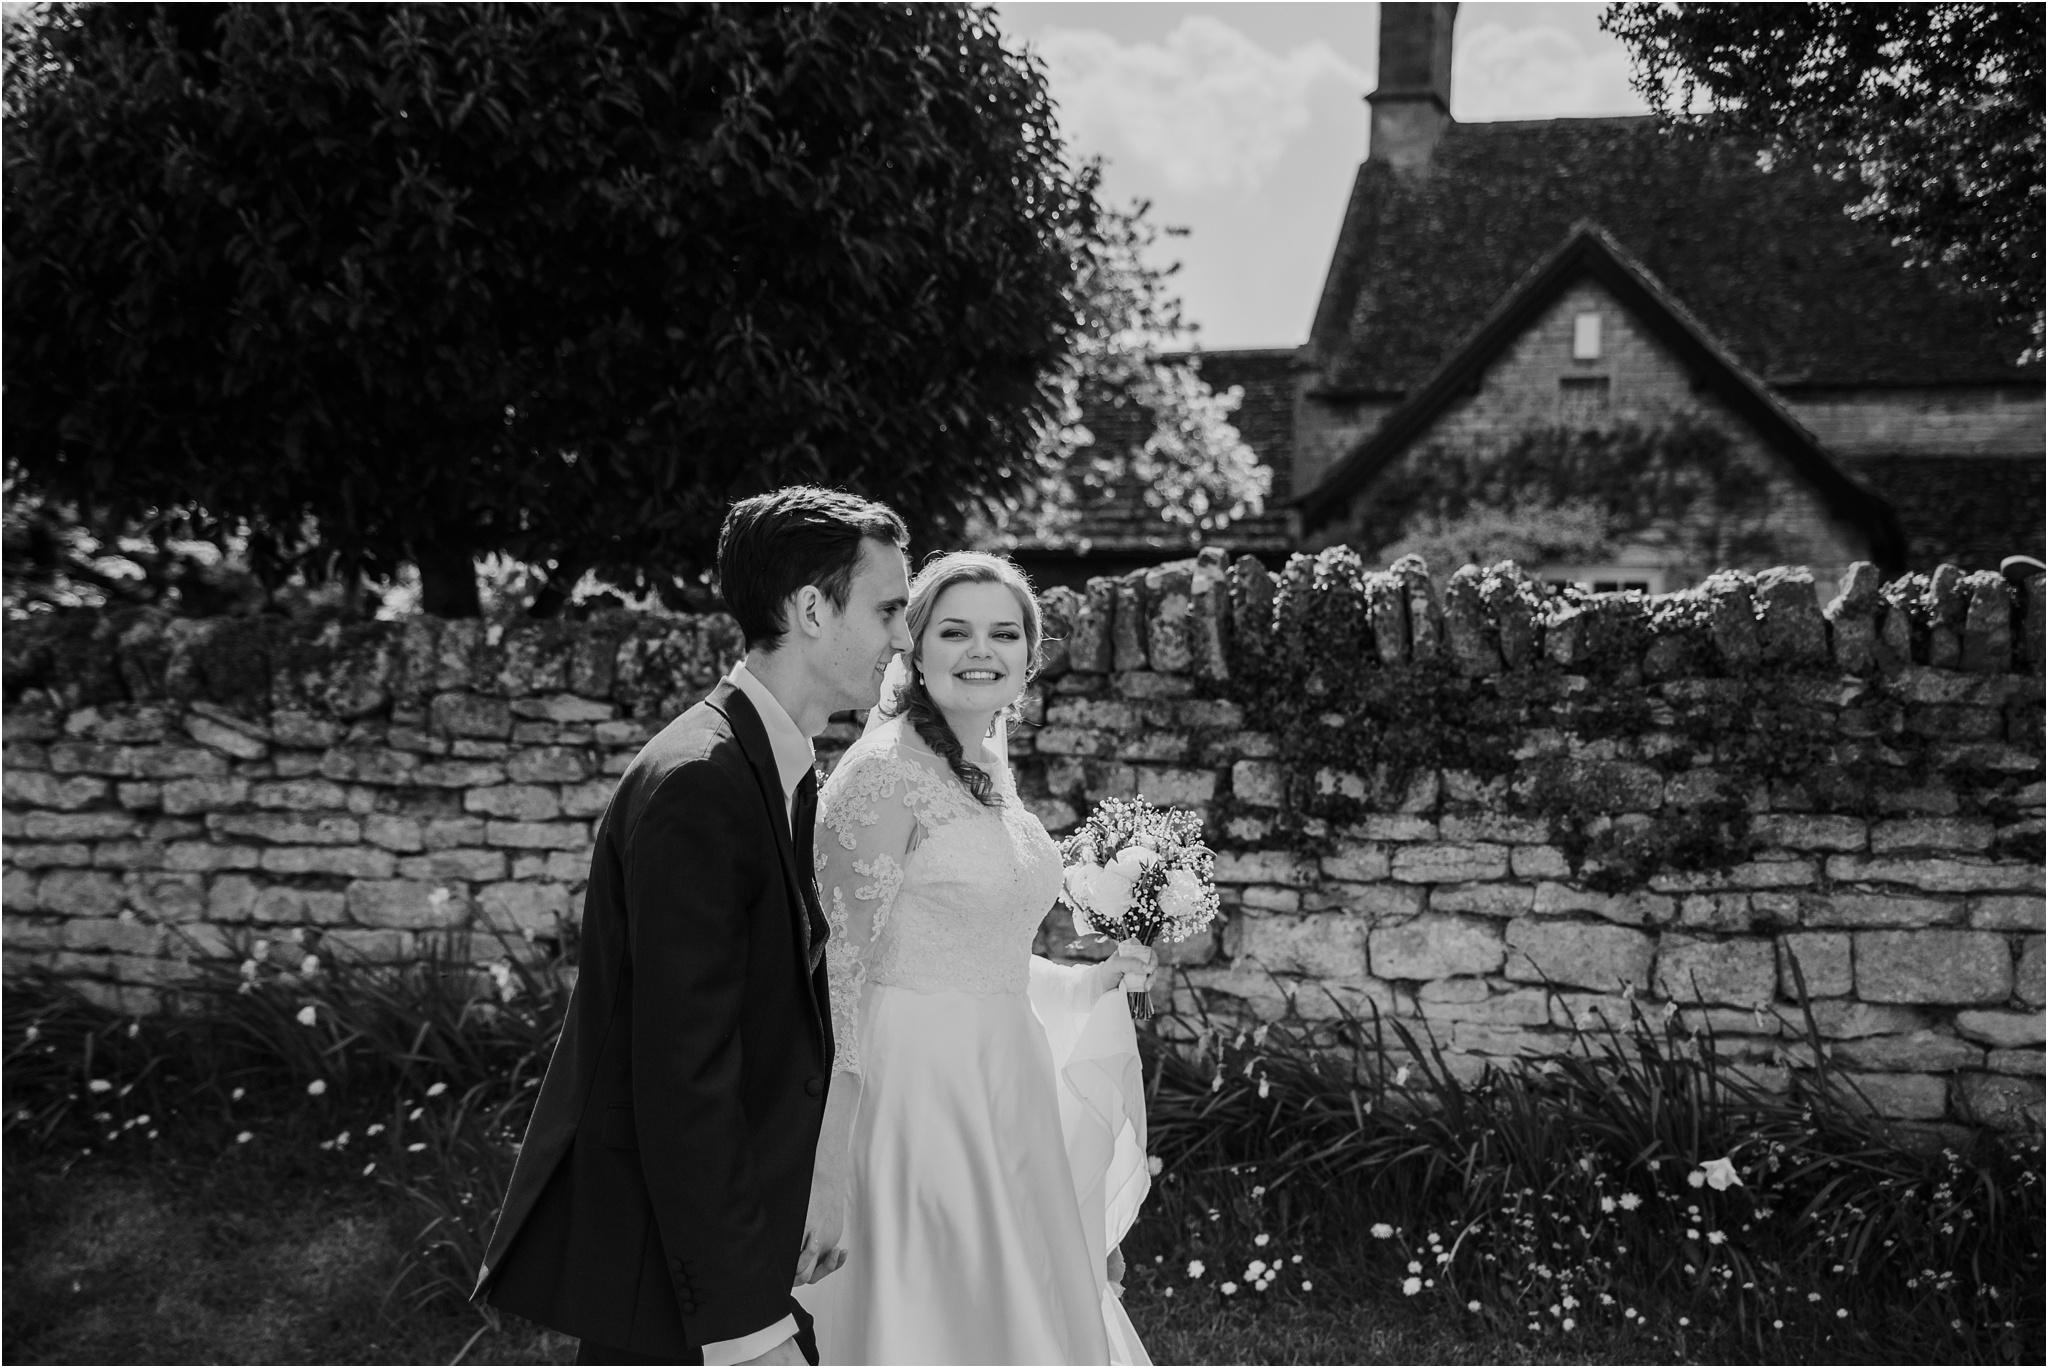 Outdoor-country-wedding-Edinburgh-photographer__0080.jpg